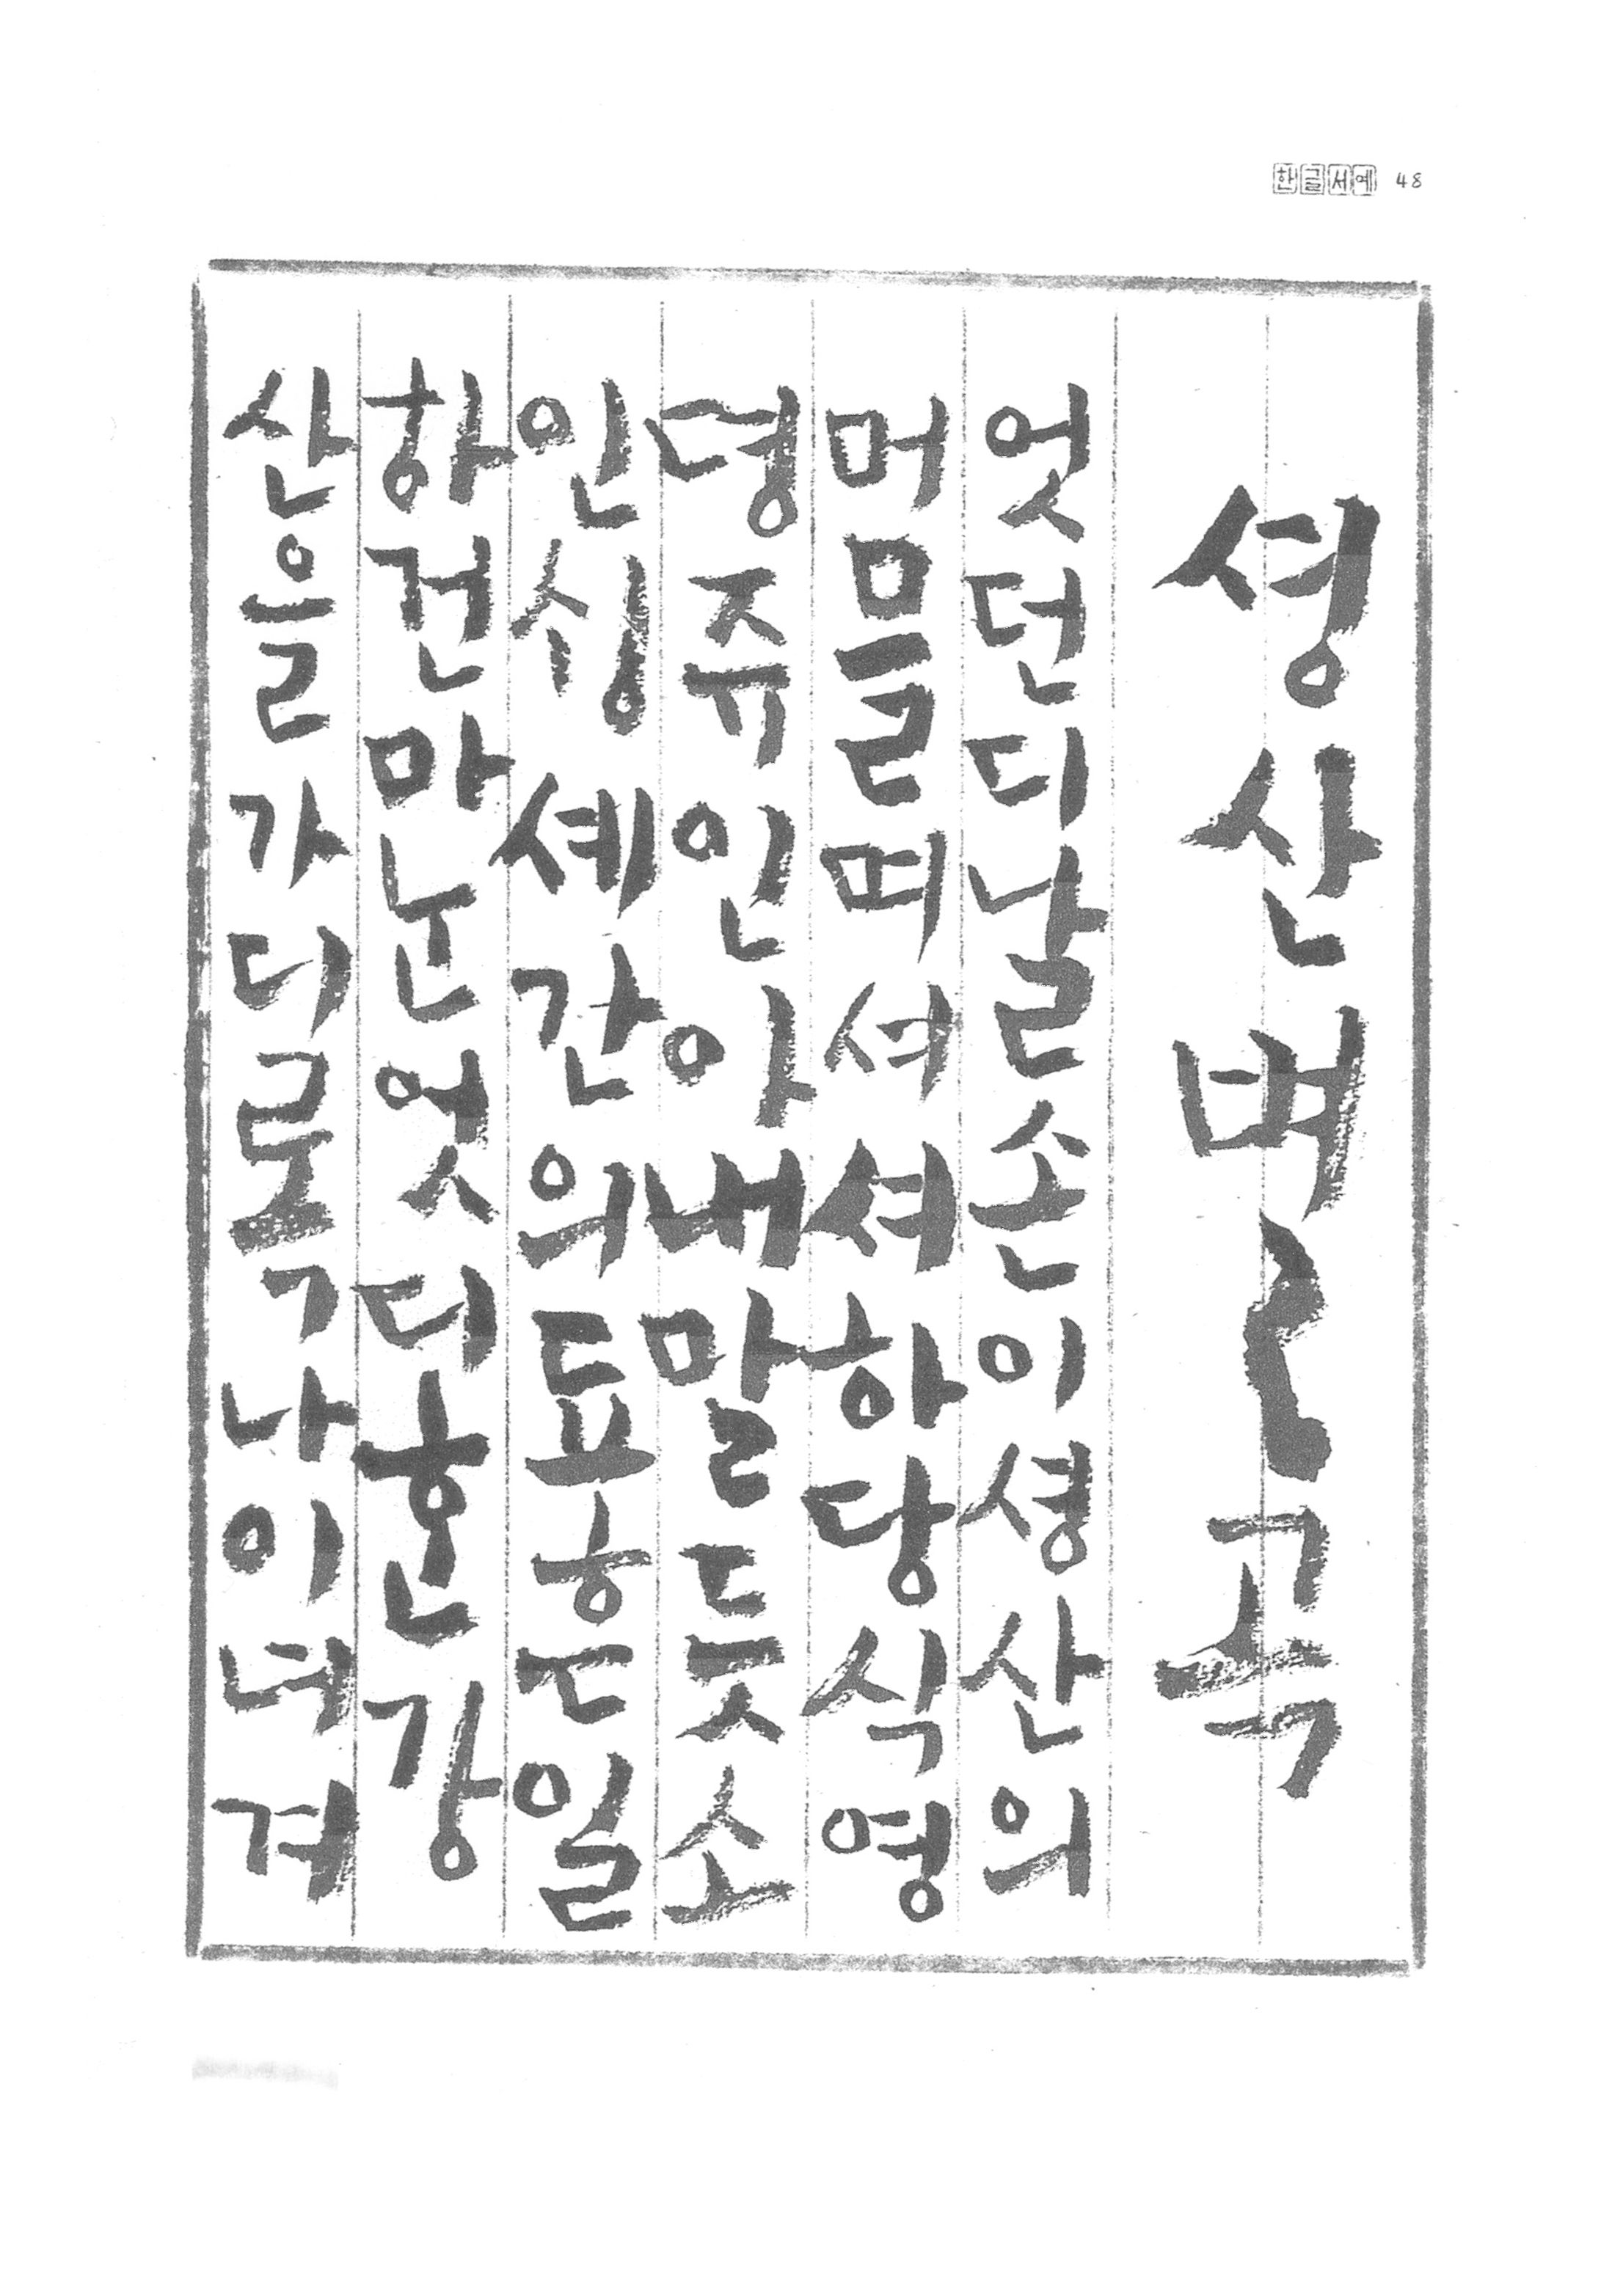 Hsyeum Syoung